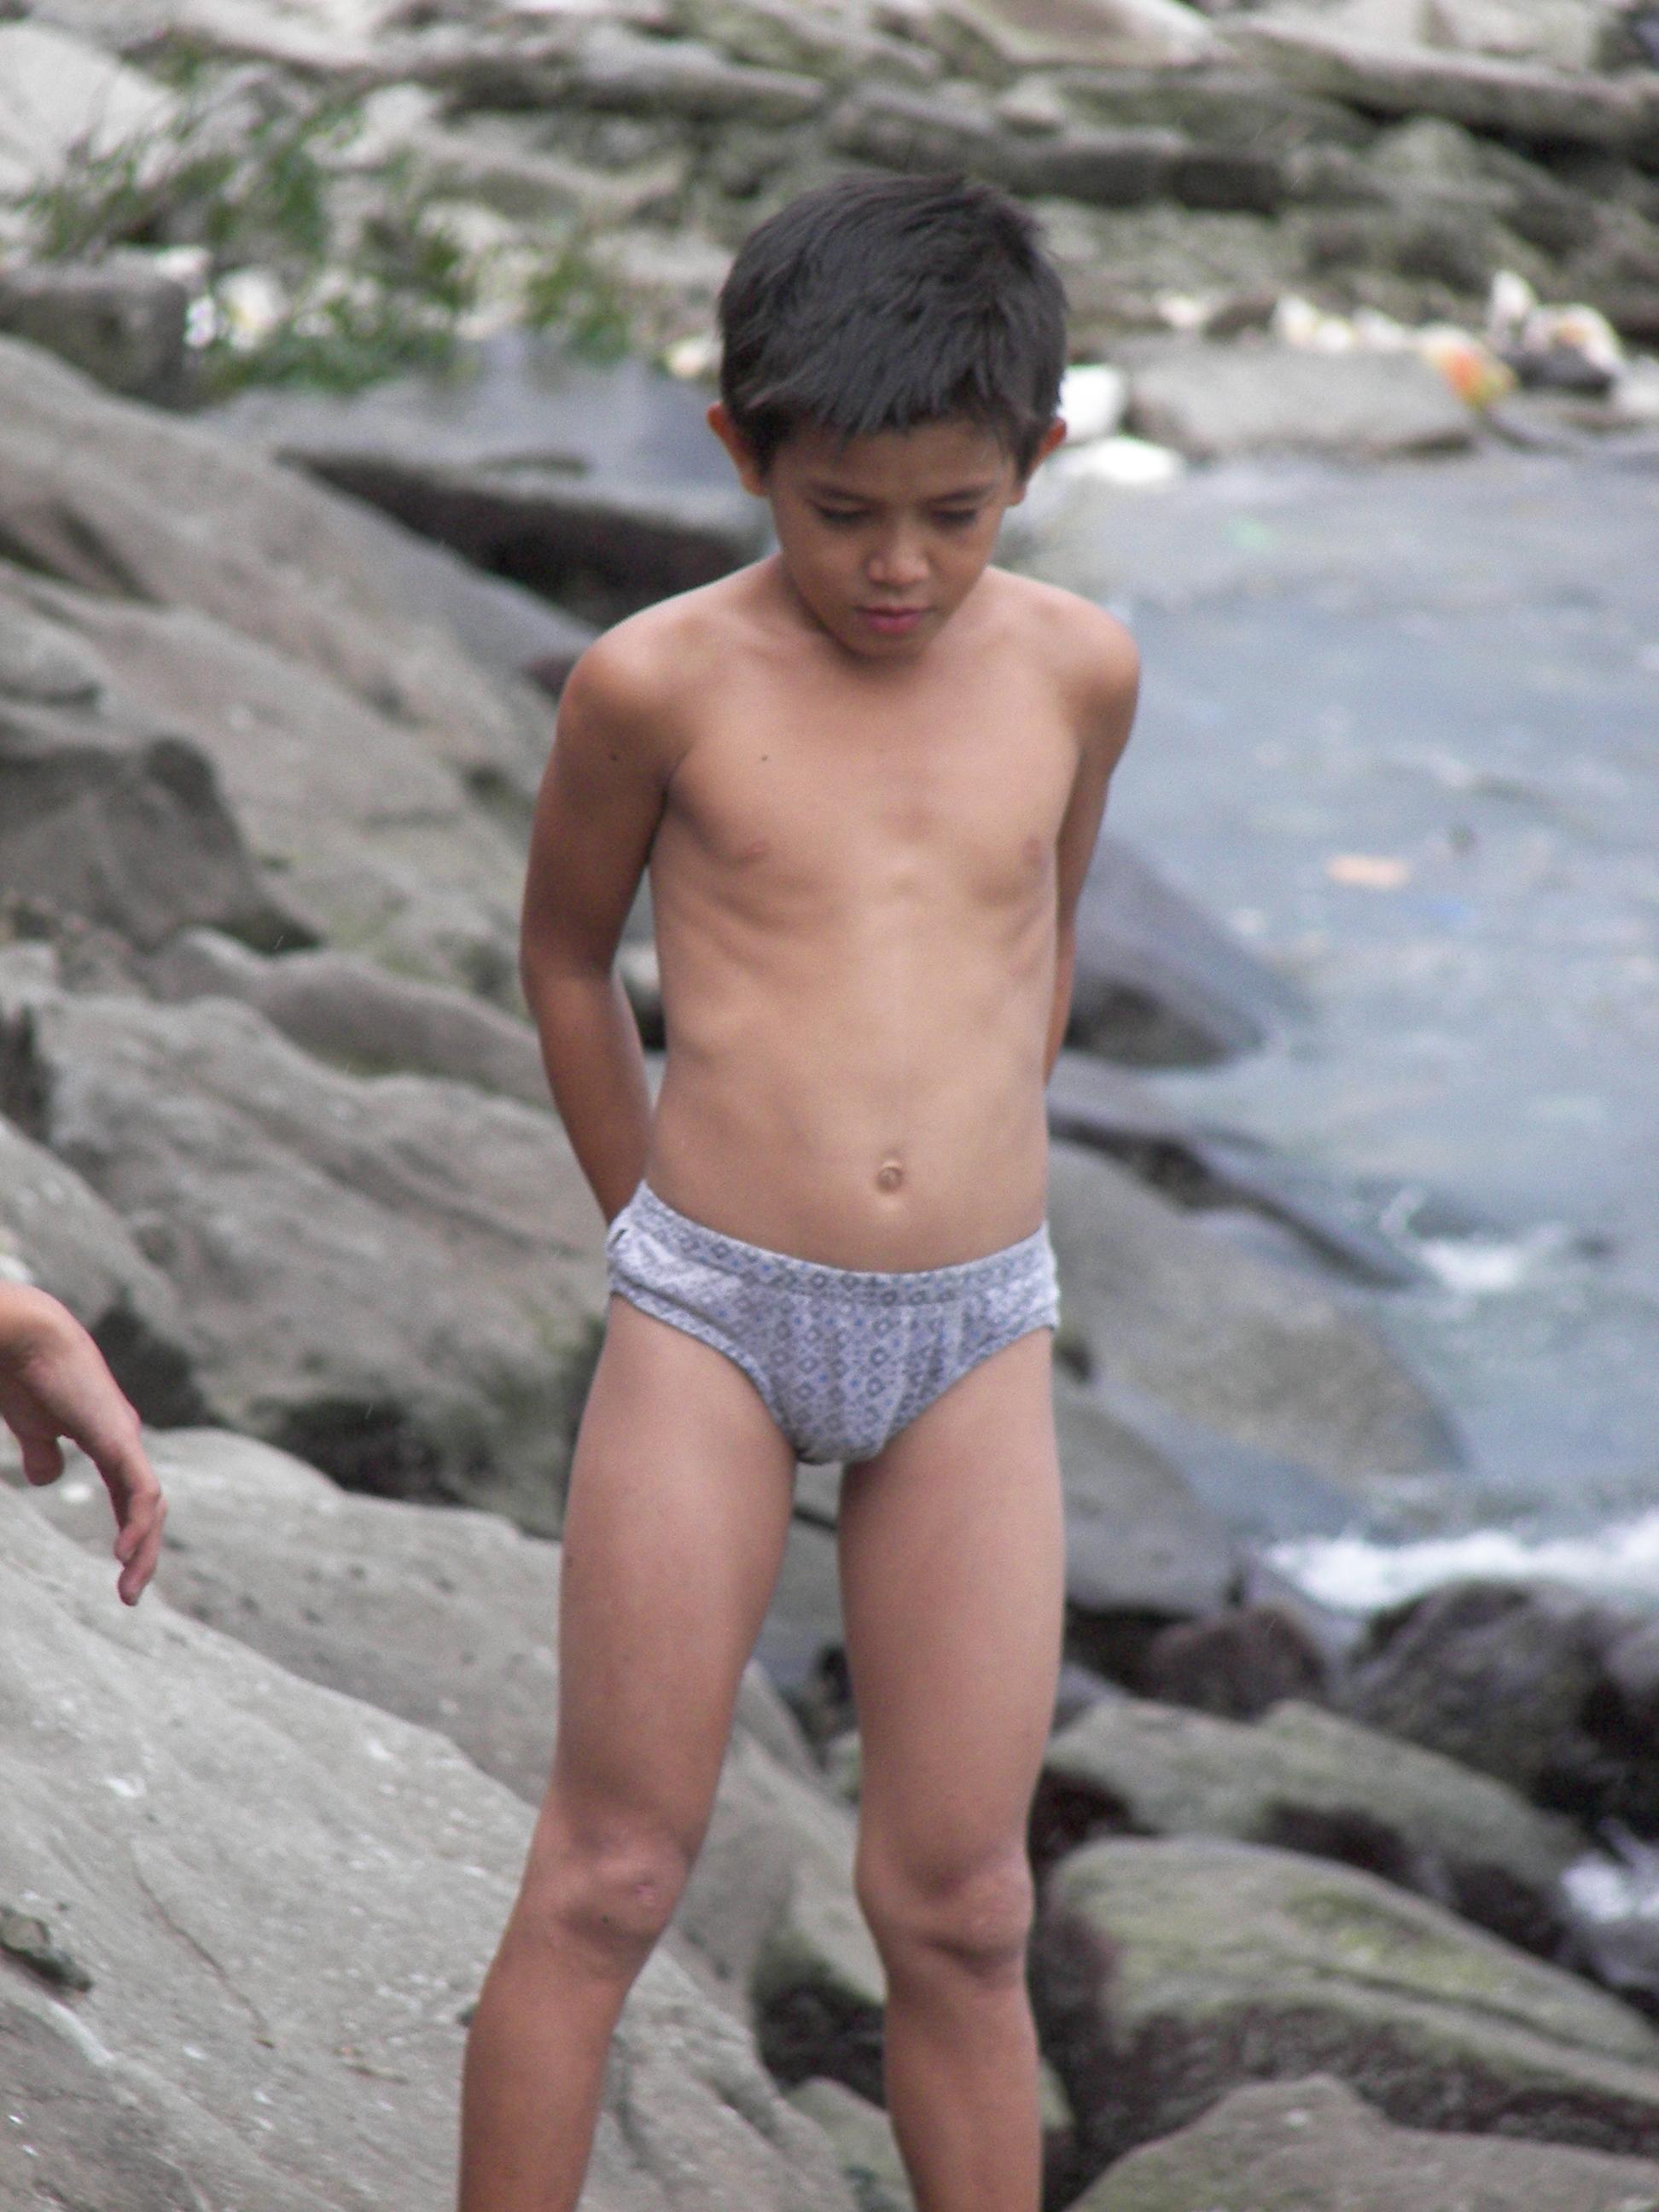 Street hunting boys nude nude image